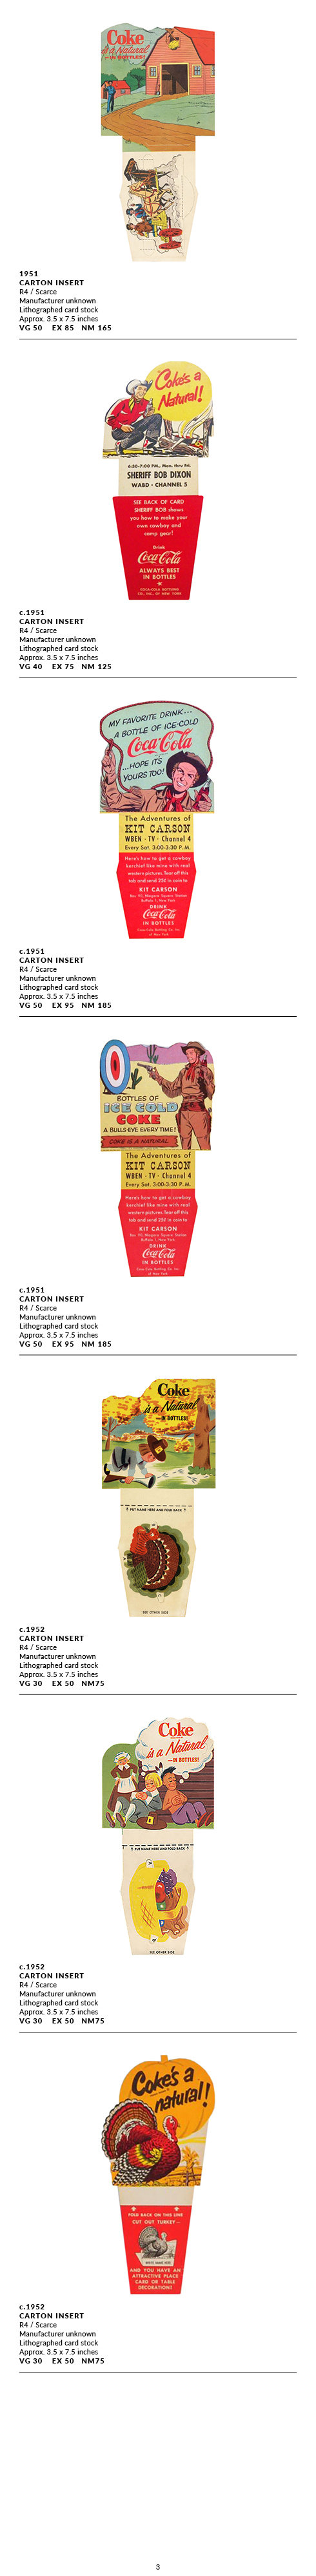 Carton Inserts3.jpg